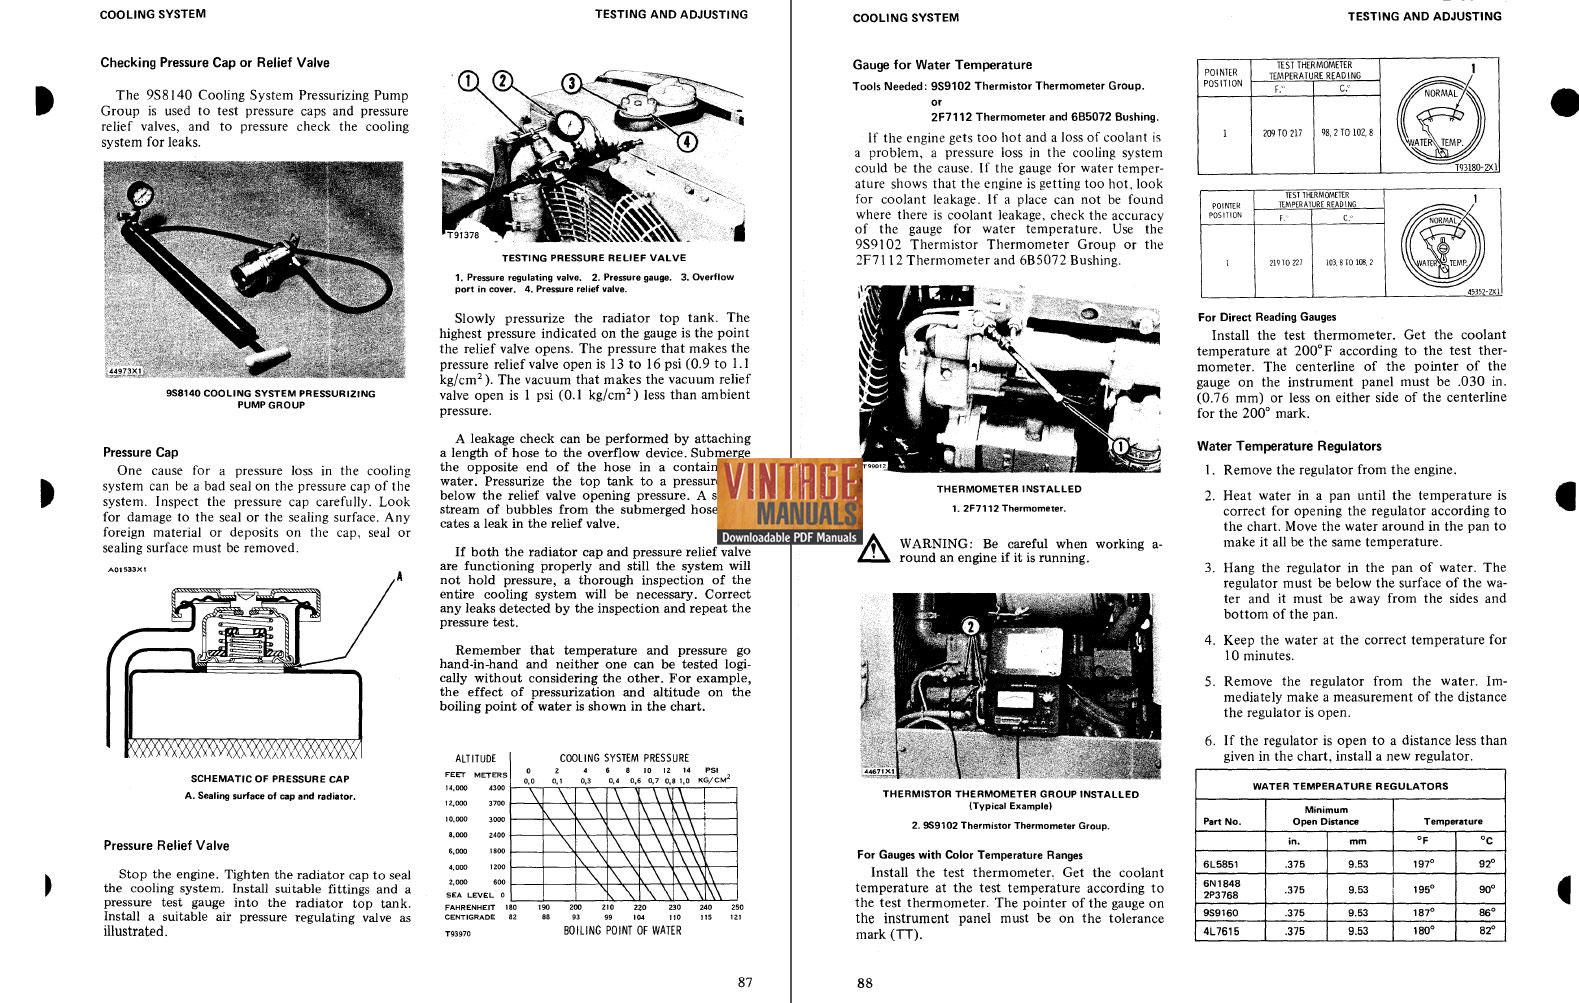 Cat 3406 Flow Diagram Trusted Wiring 3306 Engine Exhaust House Symbols U2022 3406c